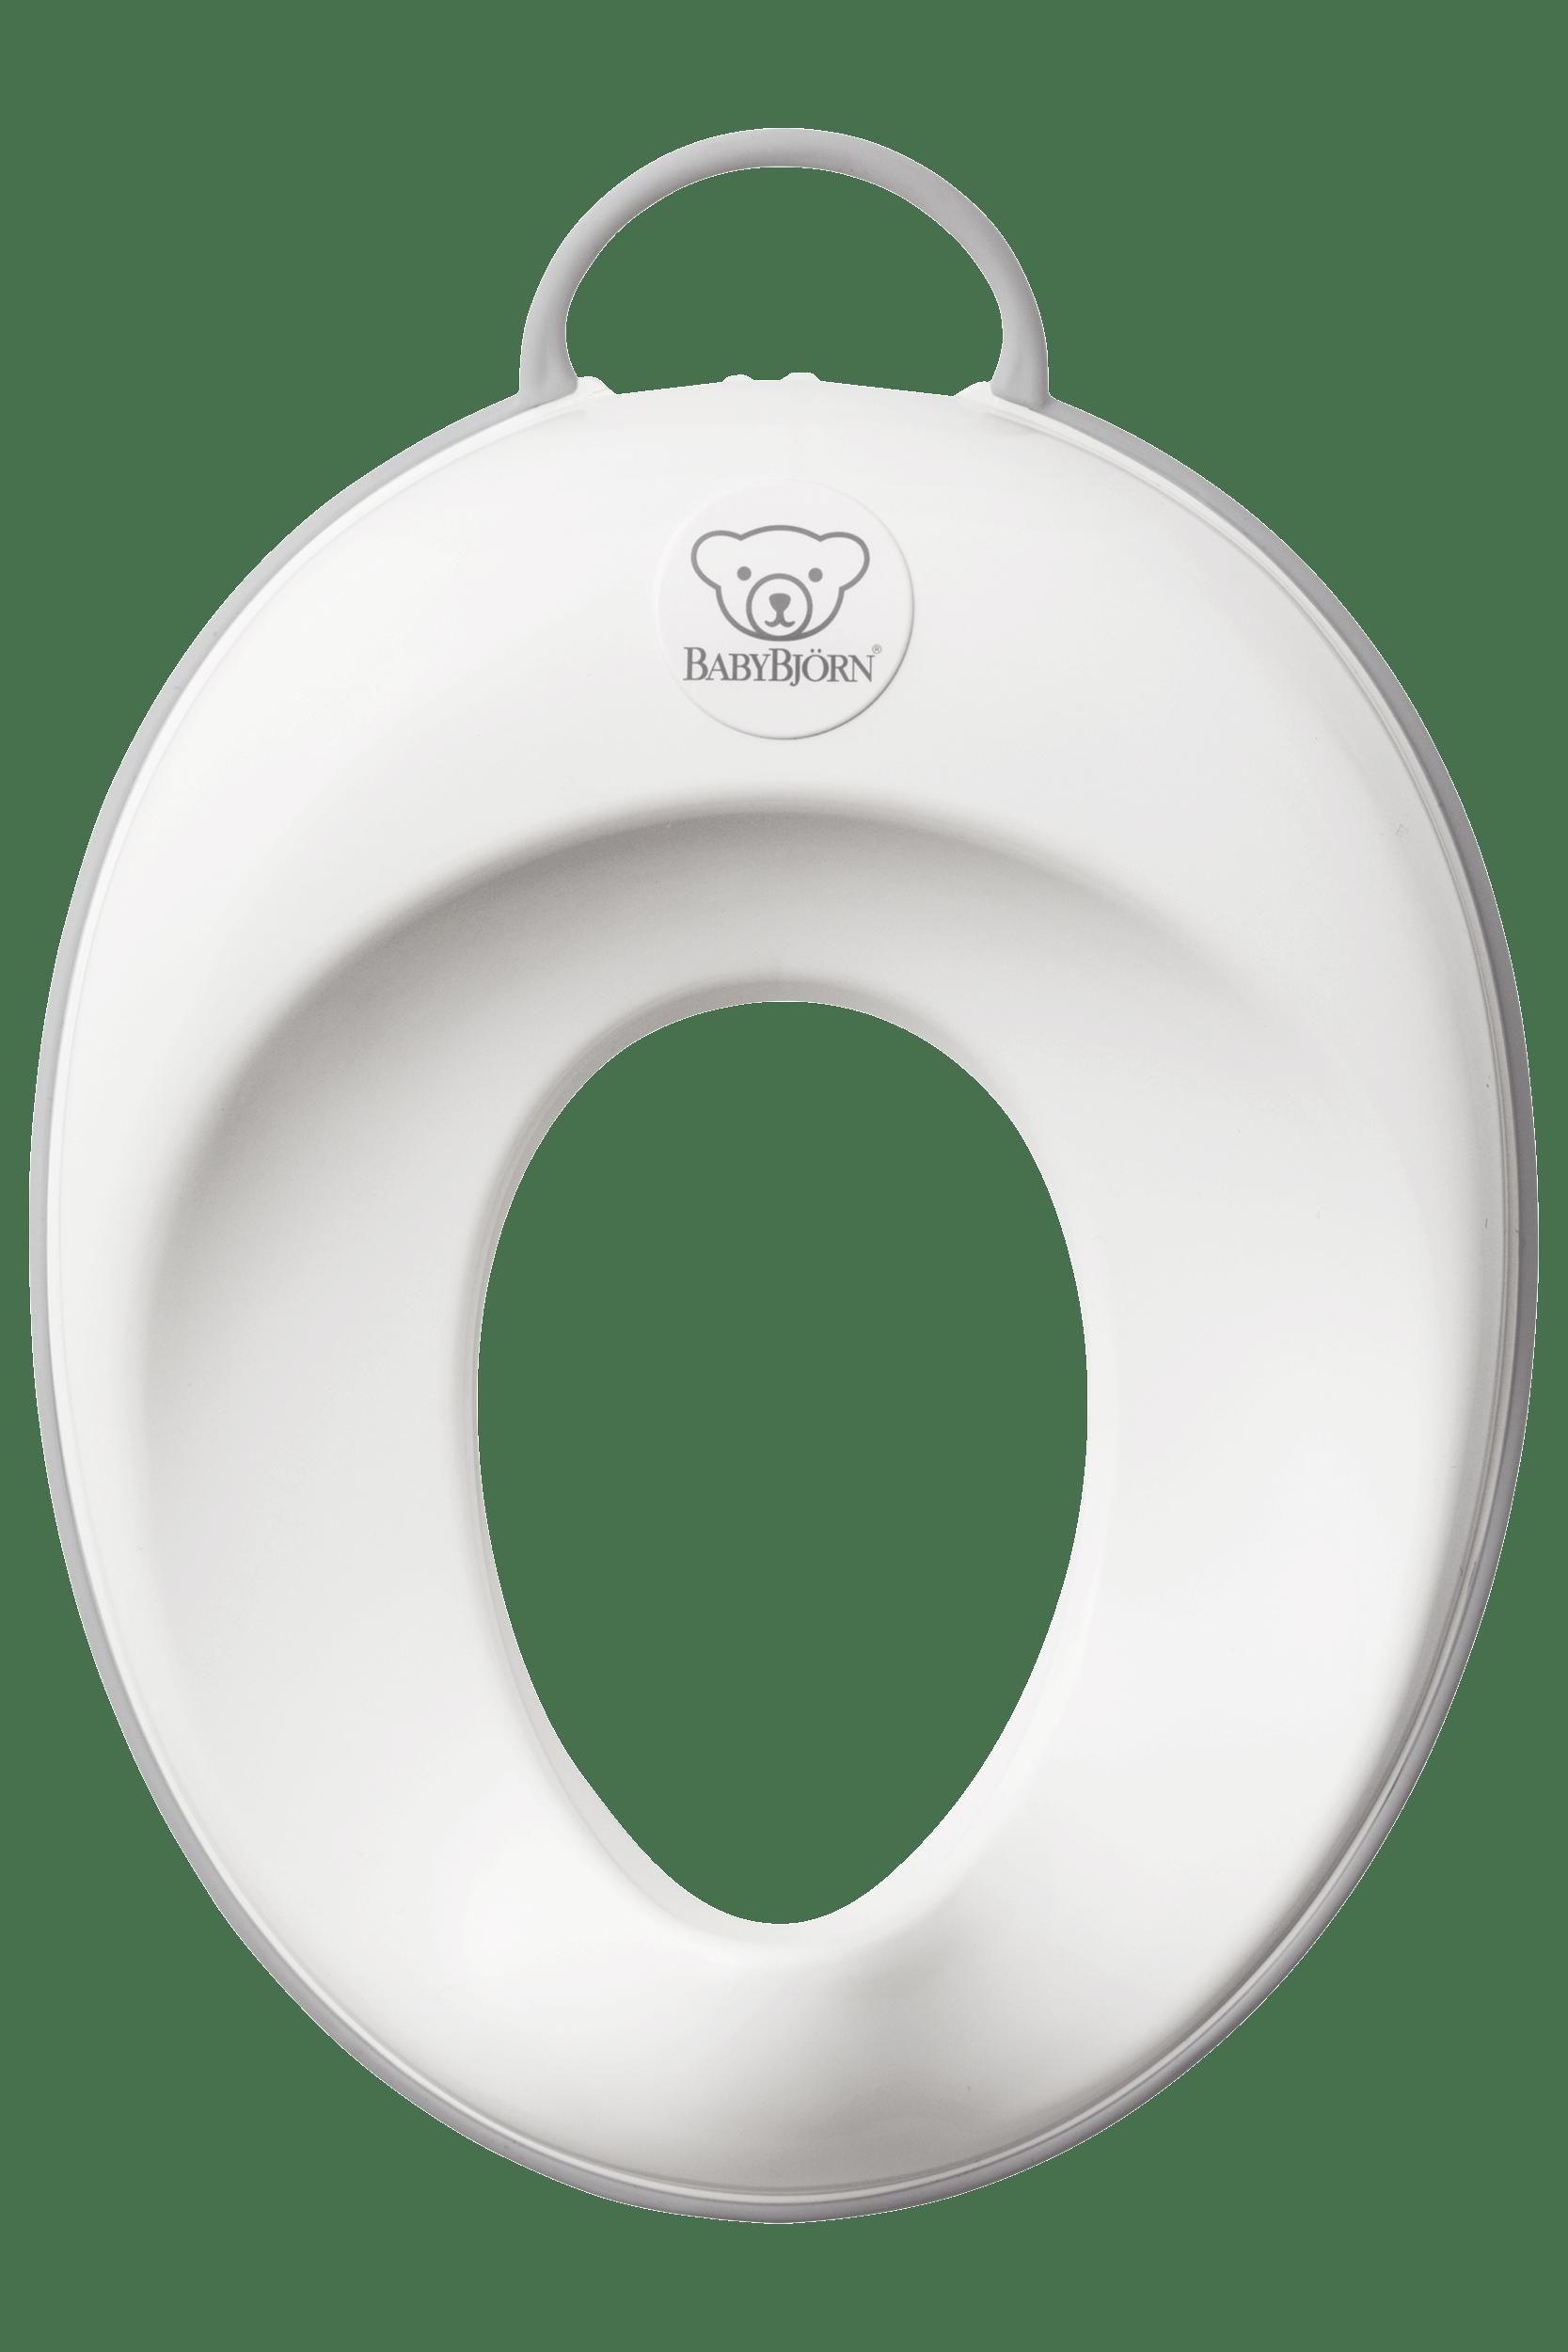 BABYBJÖRN Toilettensitz Weiss/Grau